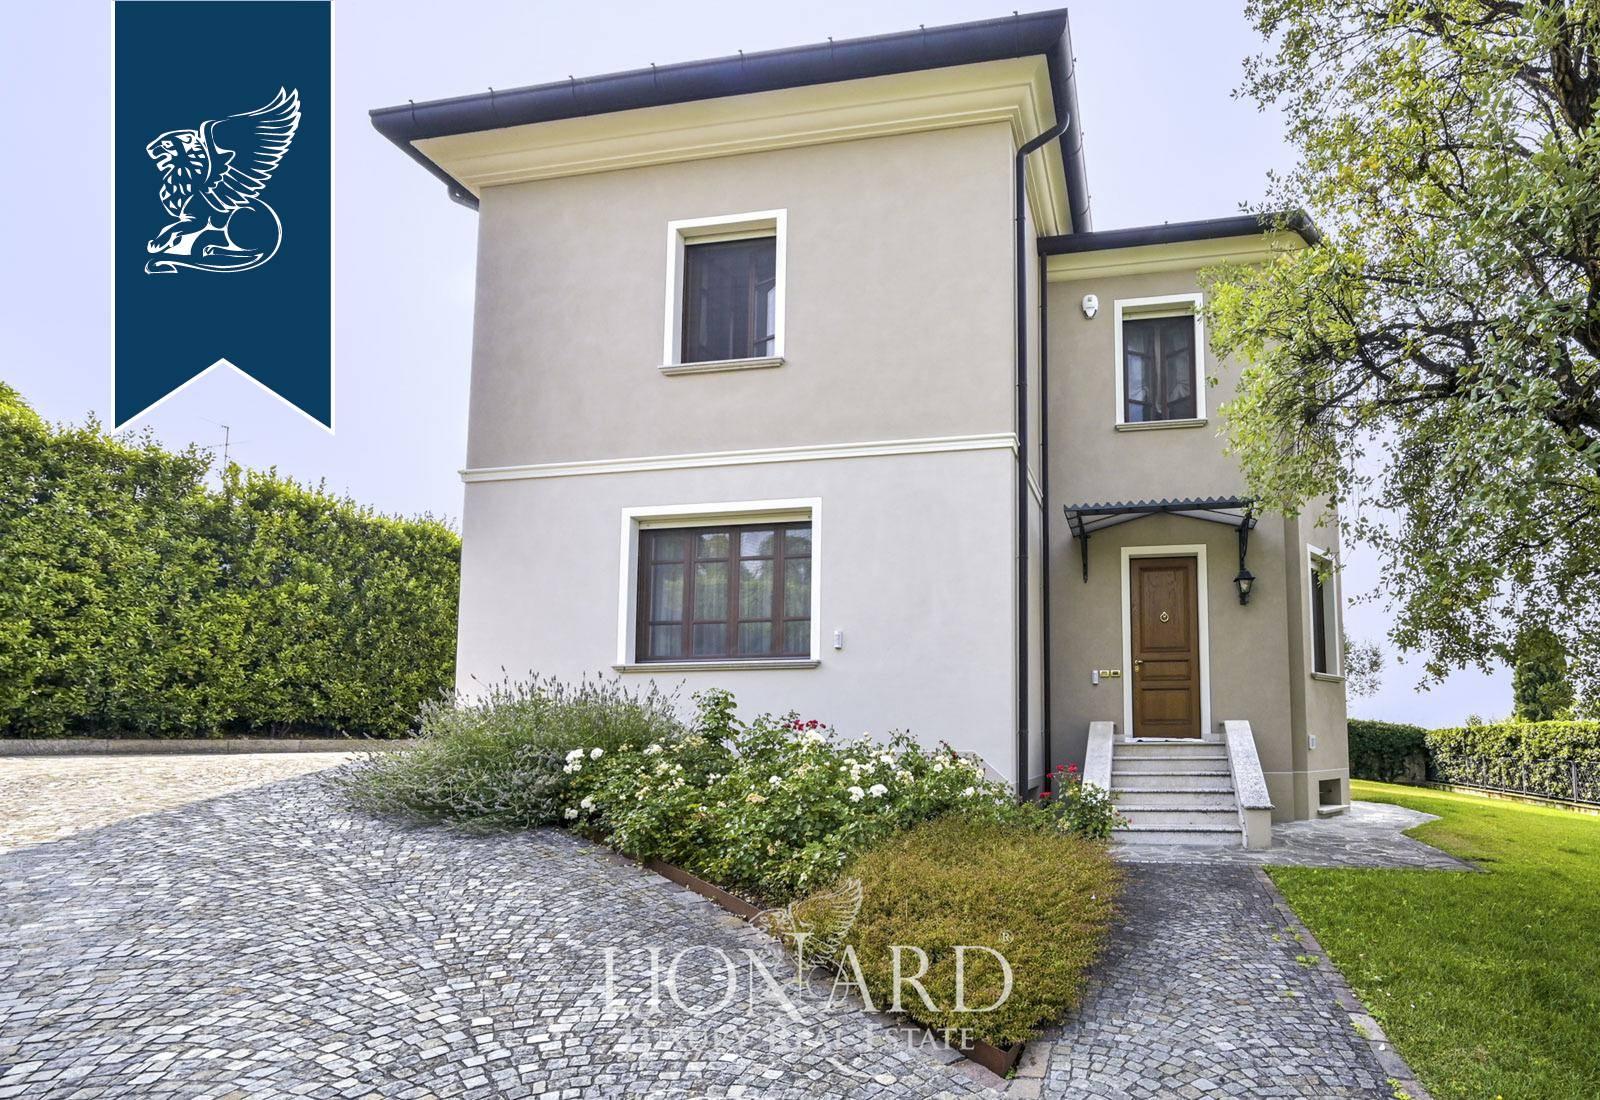 Villa in Vendita a Erbusco: 0 locali, 400 mq - Foto 2